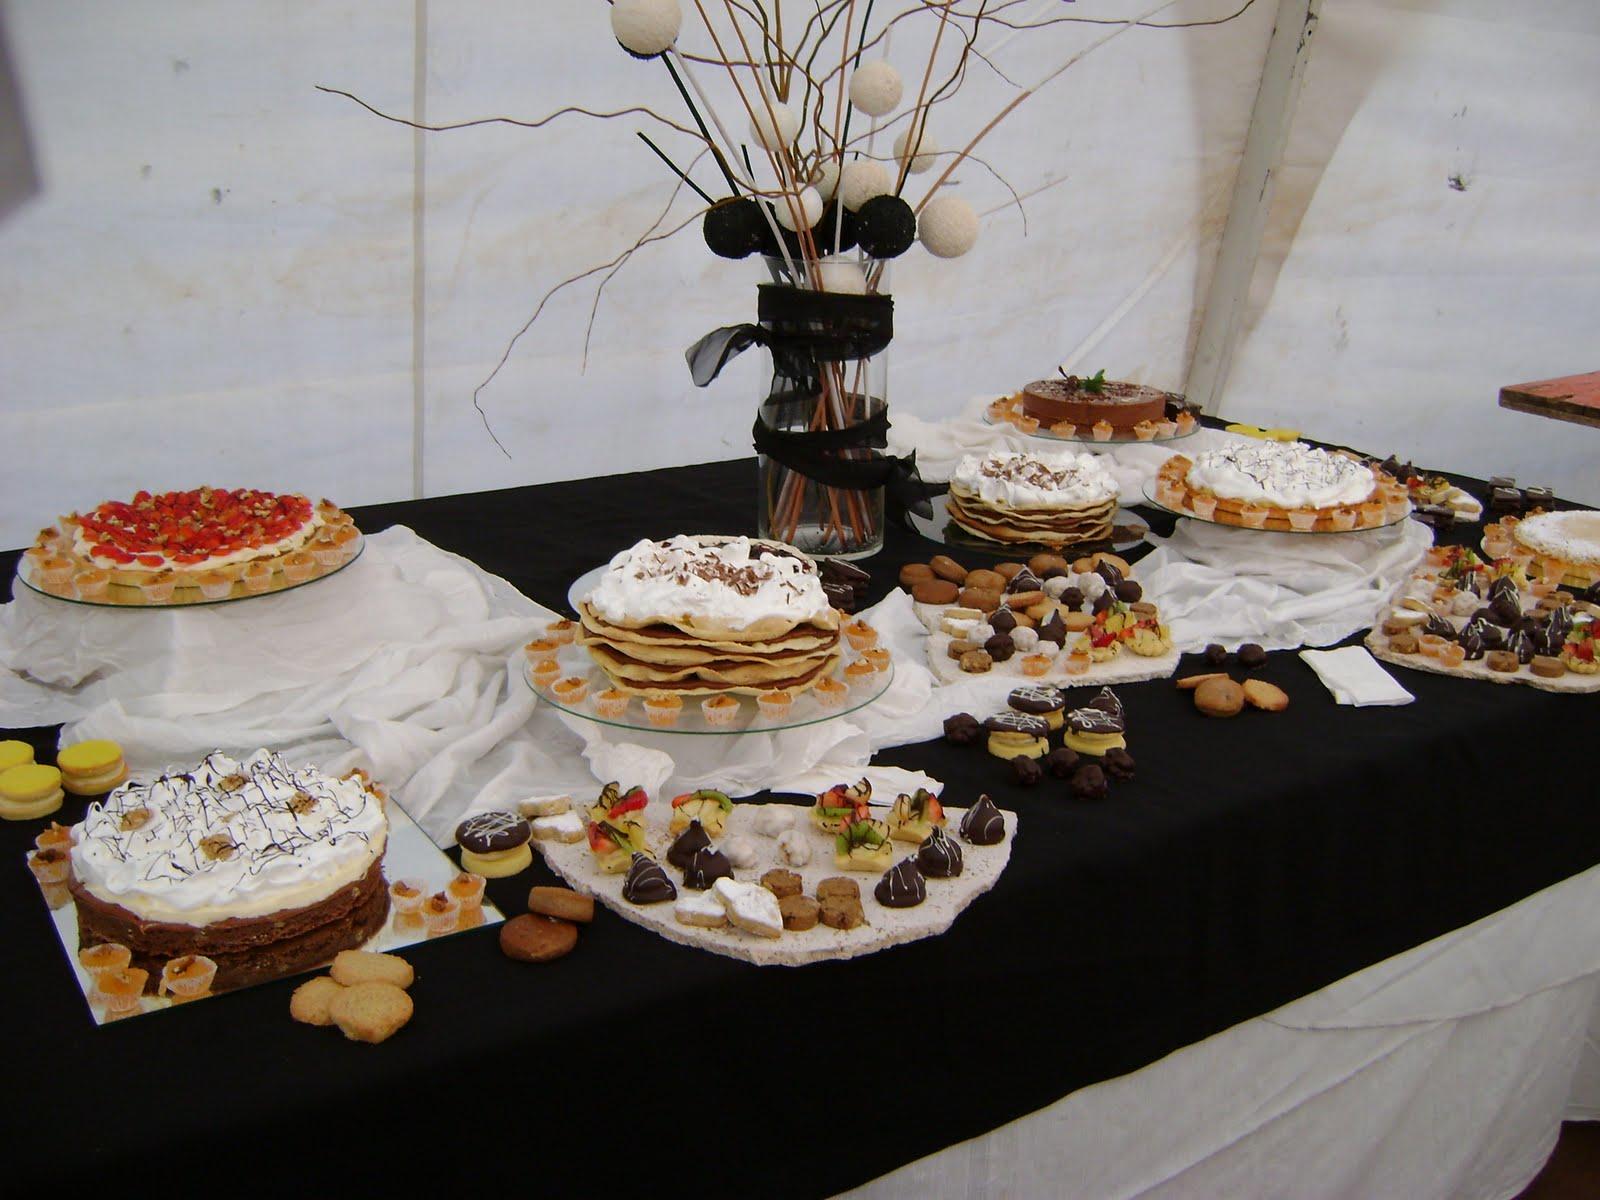 Pasteleria date el gusto mesas dulces for Decoracion mesas dulces